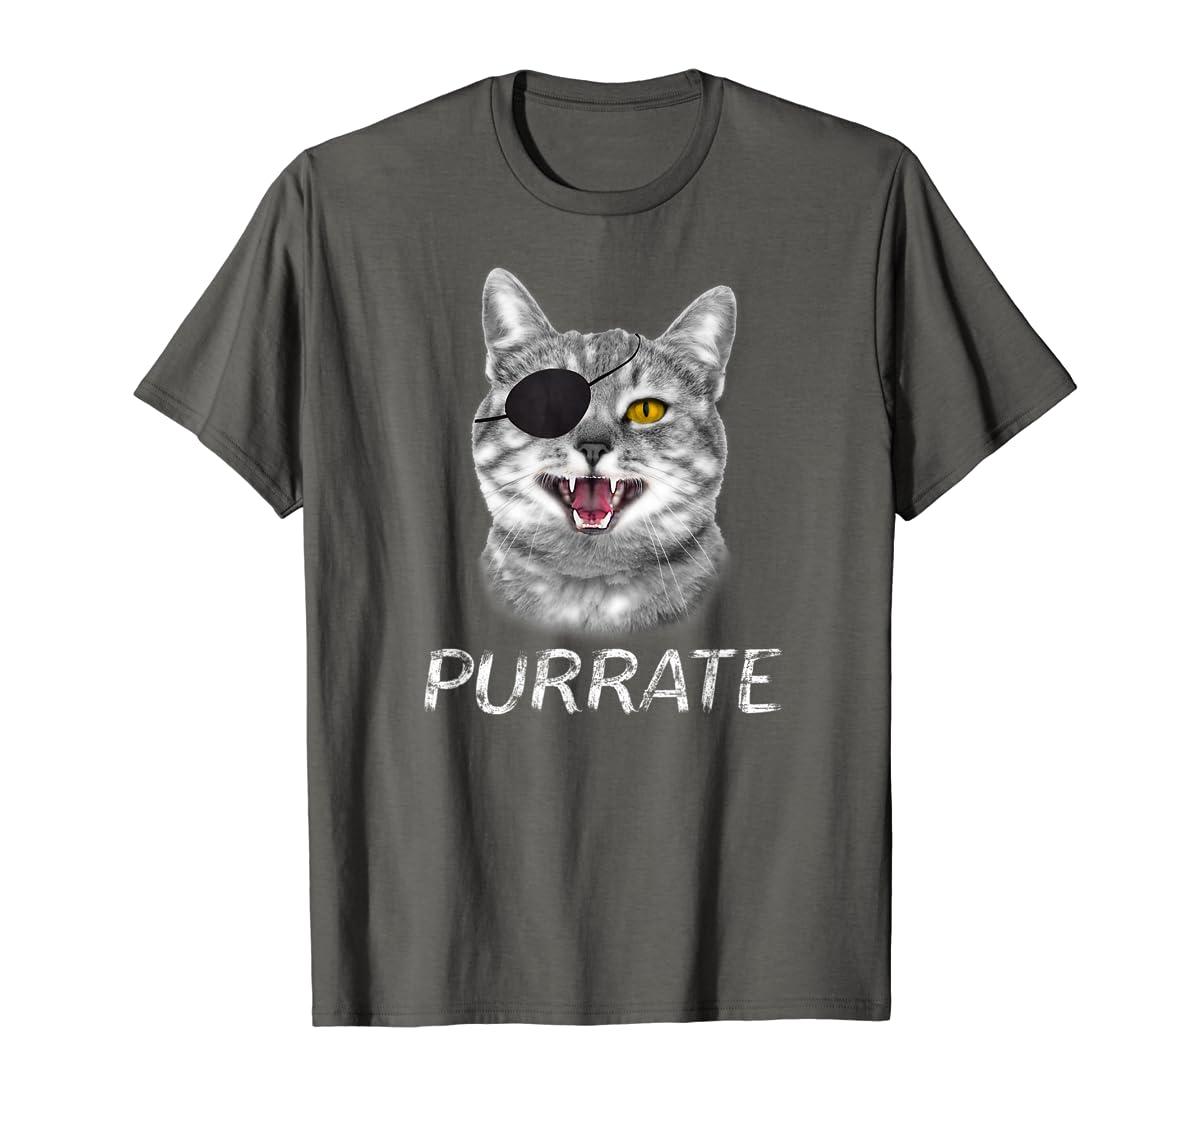 Halloween Trick Treat Cat Pirate Purrate T-Shirt-Men's T-Shirt-Dark Heather